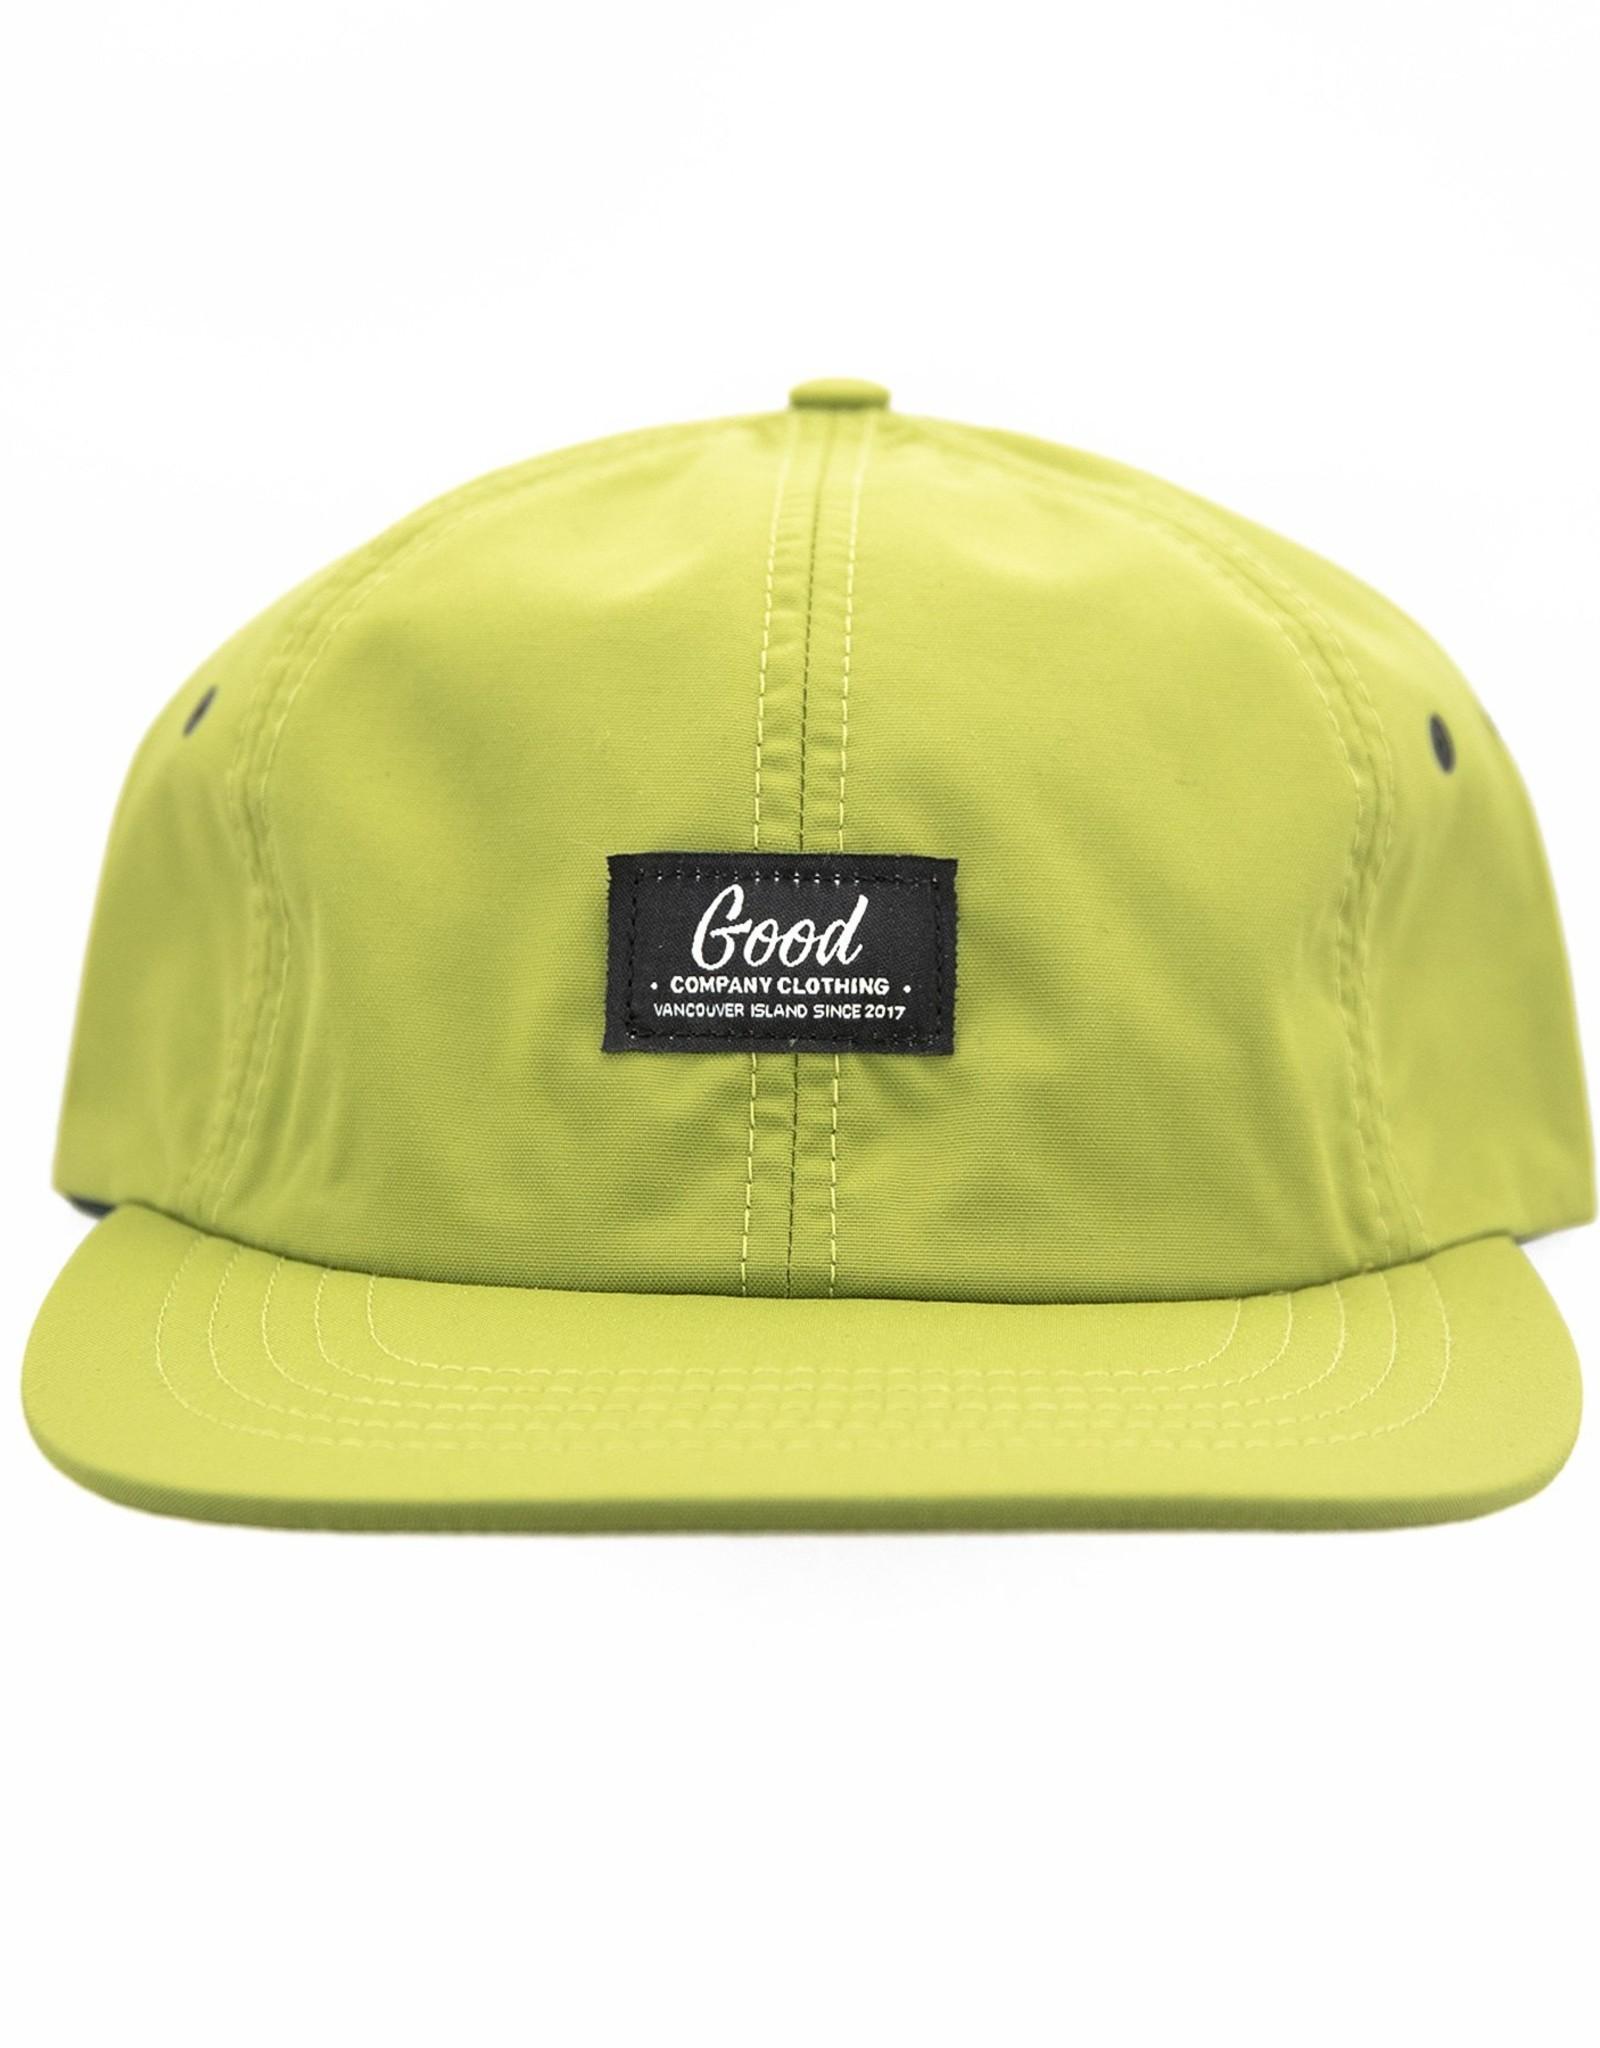 Good Company Clothing Good Co Dominion Hat Green